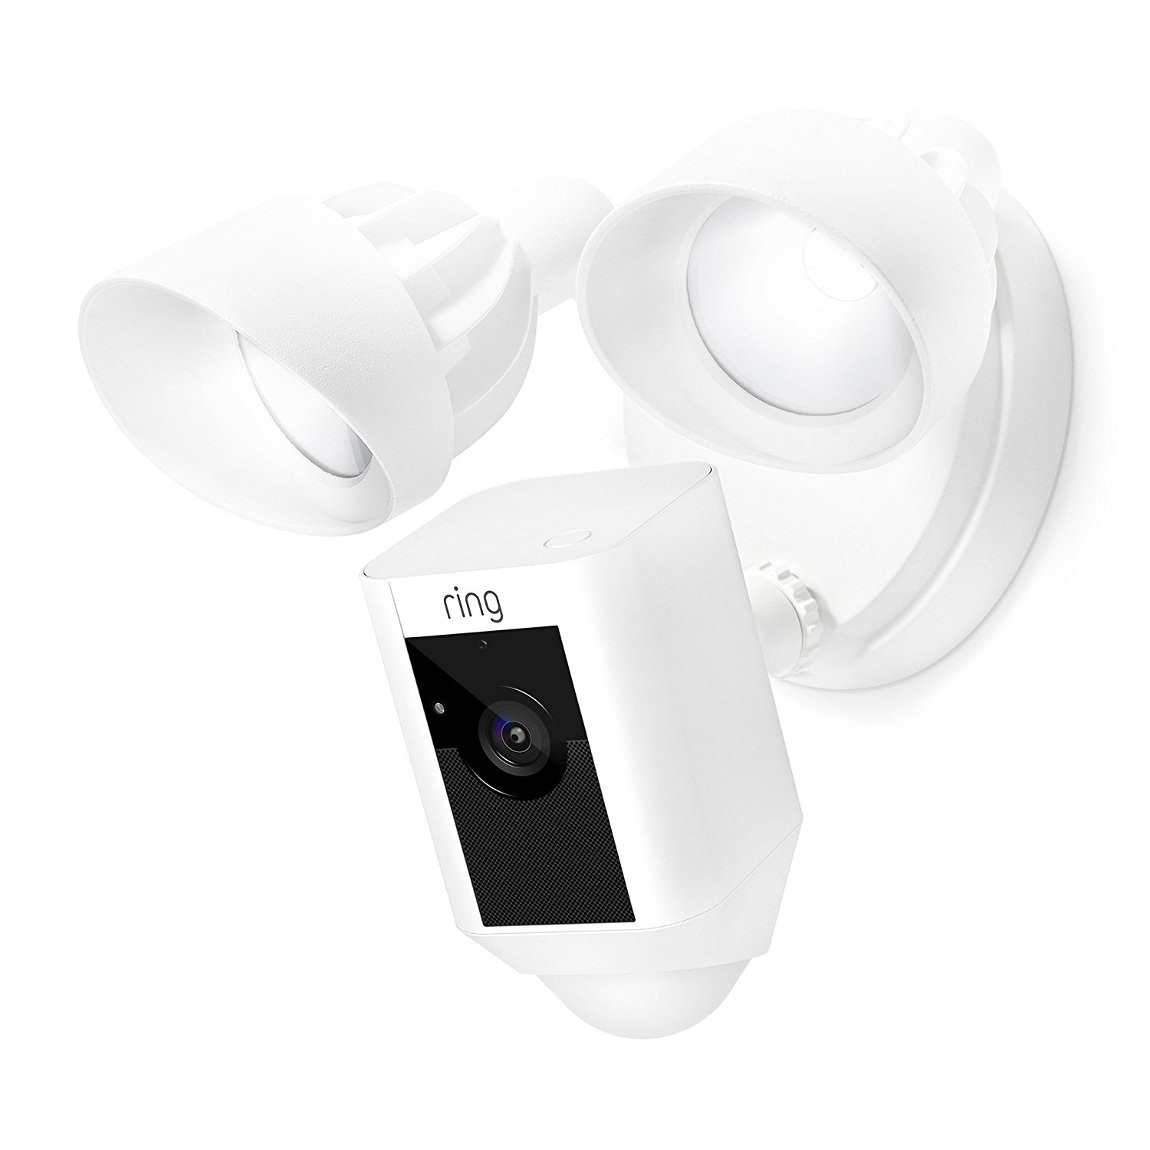 Ring Floodlight Cam - HD-Kamera mit Flutlicht -...